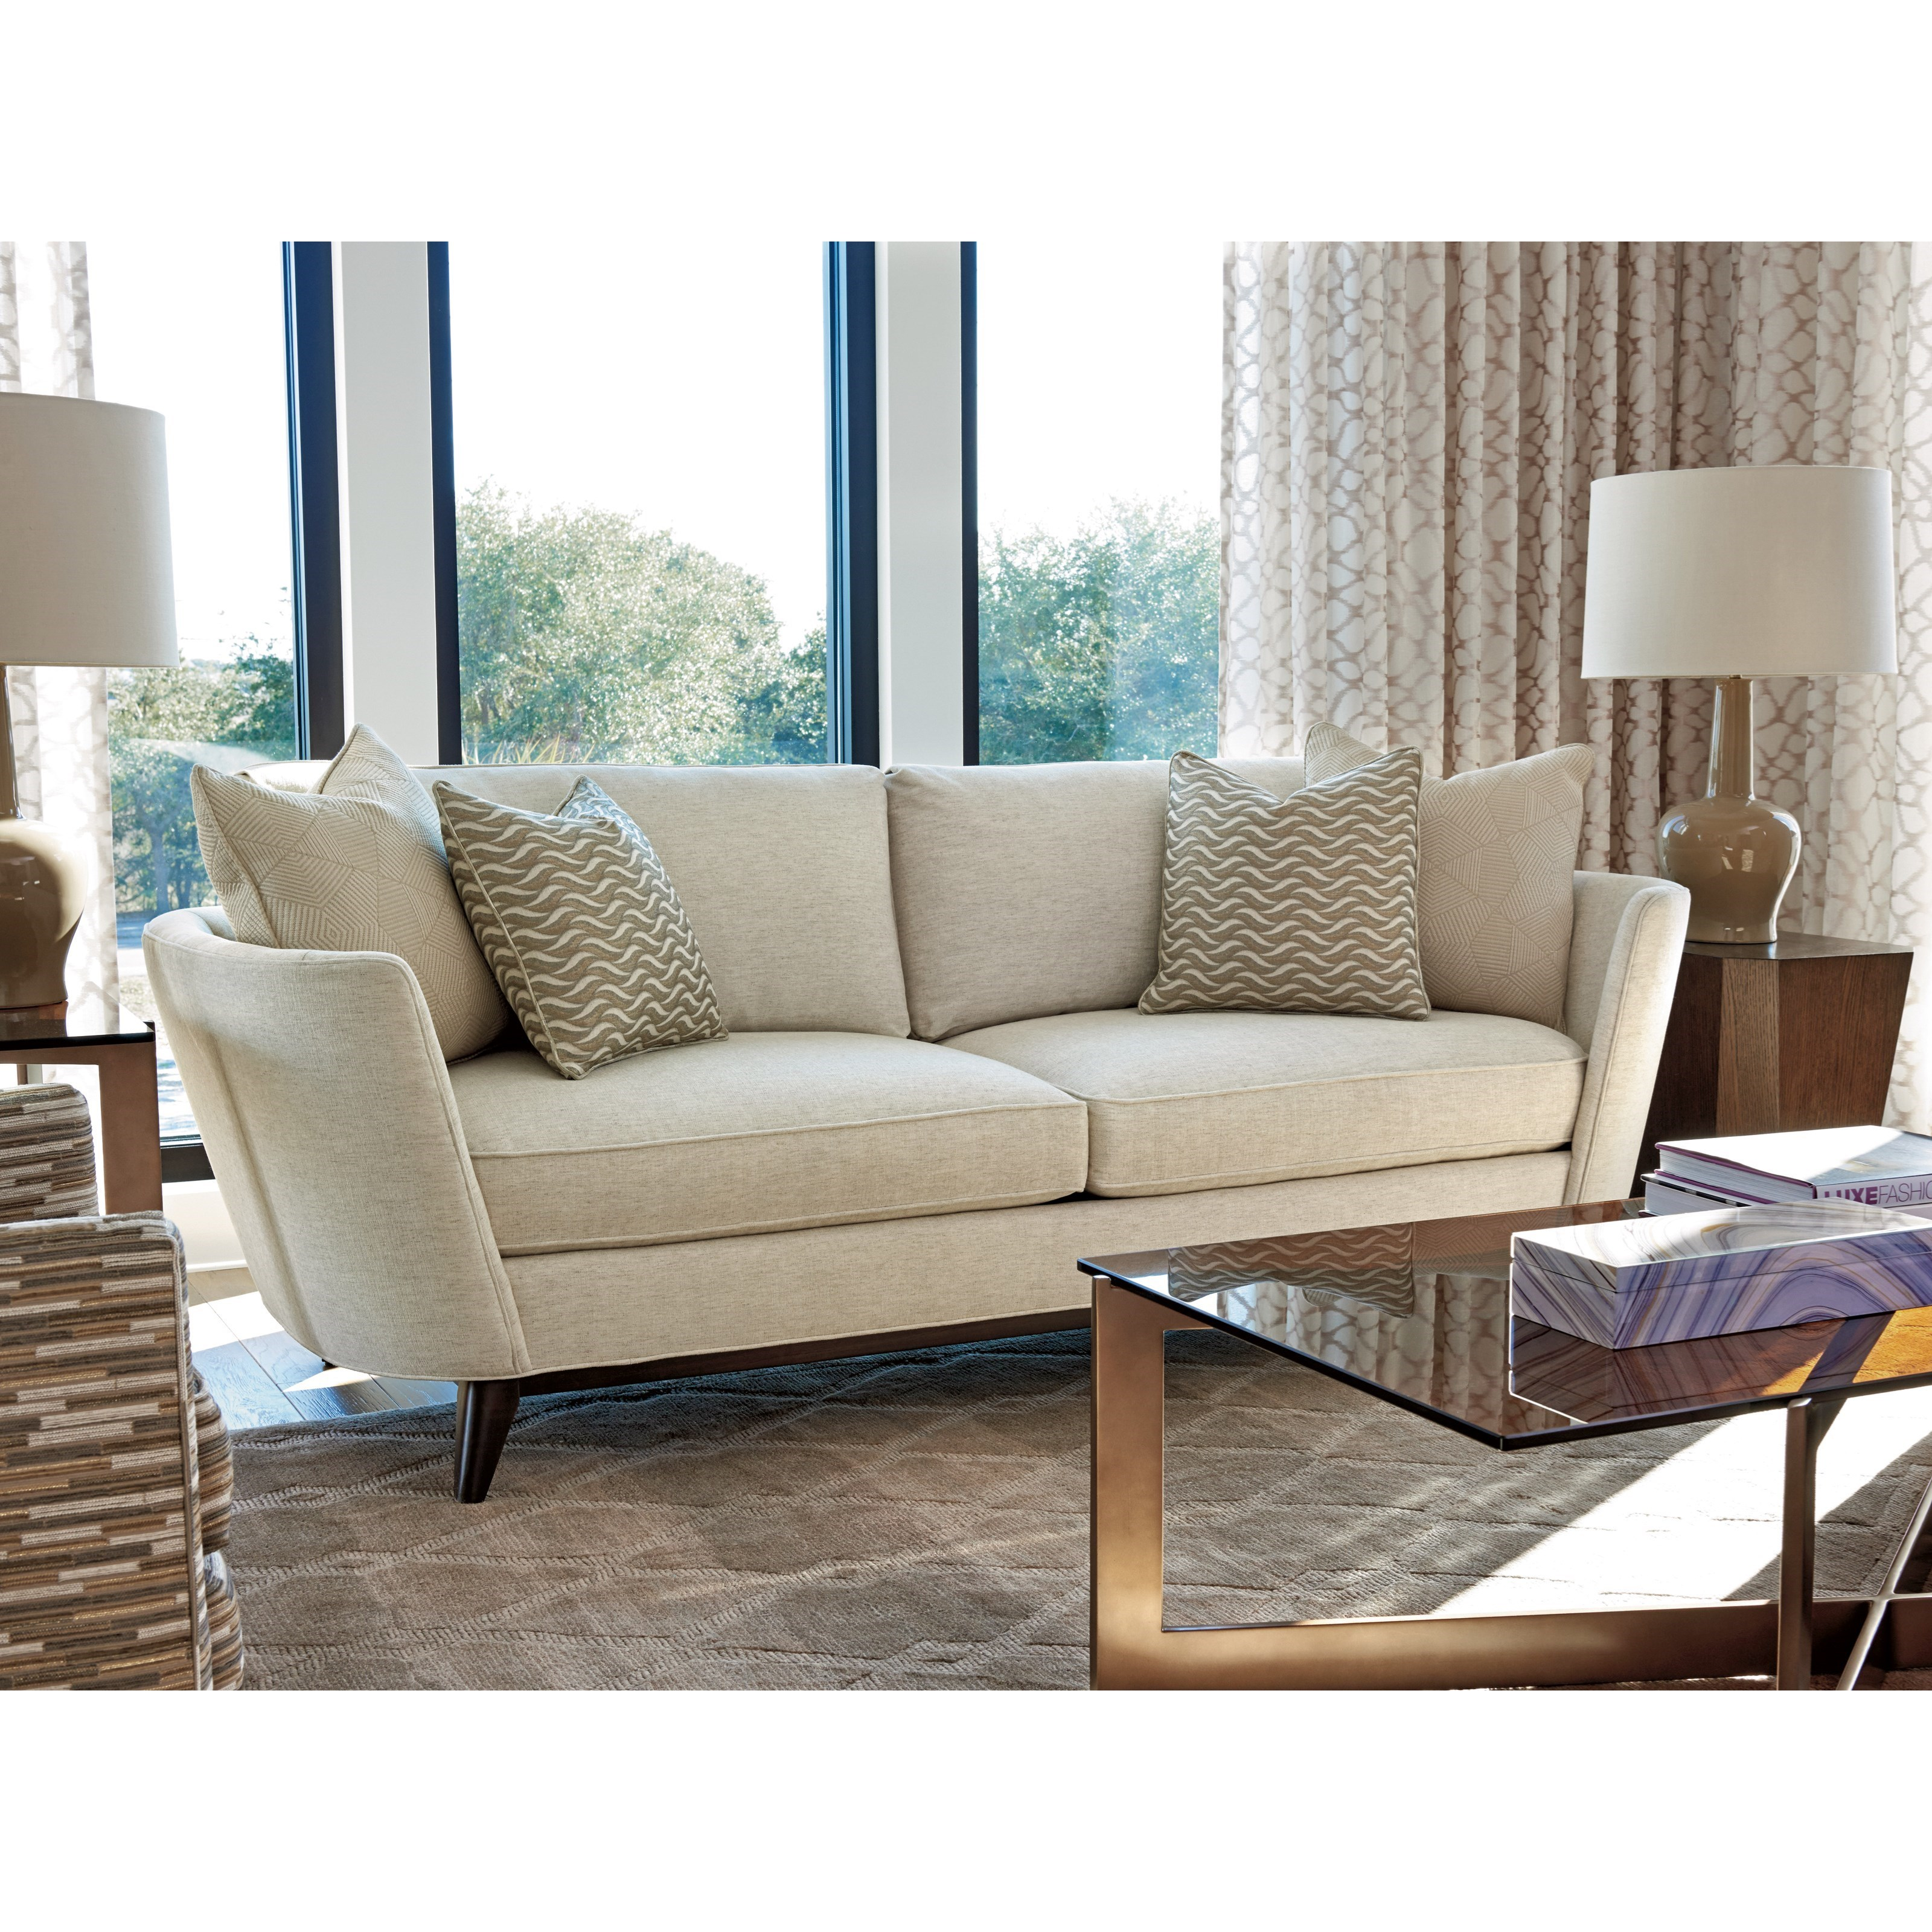 lexington sectional sofa mission style set zavala kahn modern belfort furniture sofas